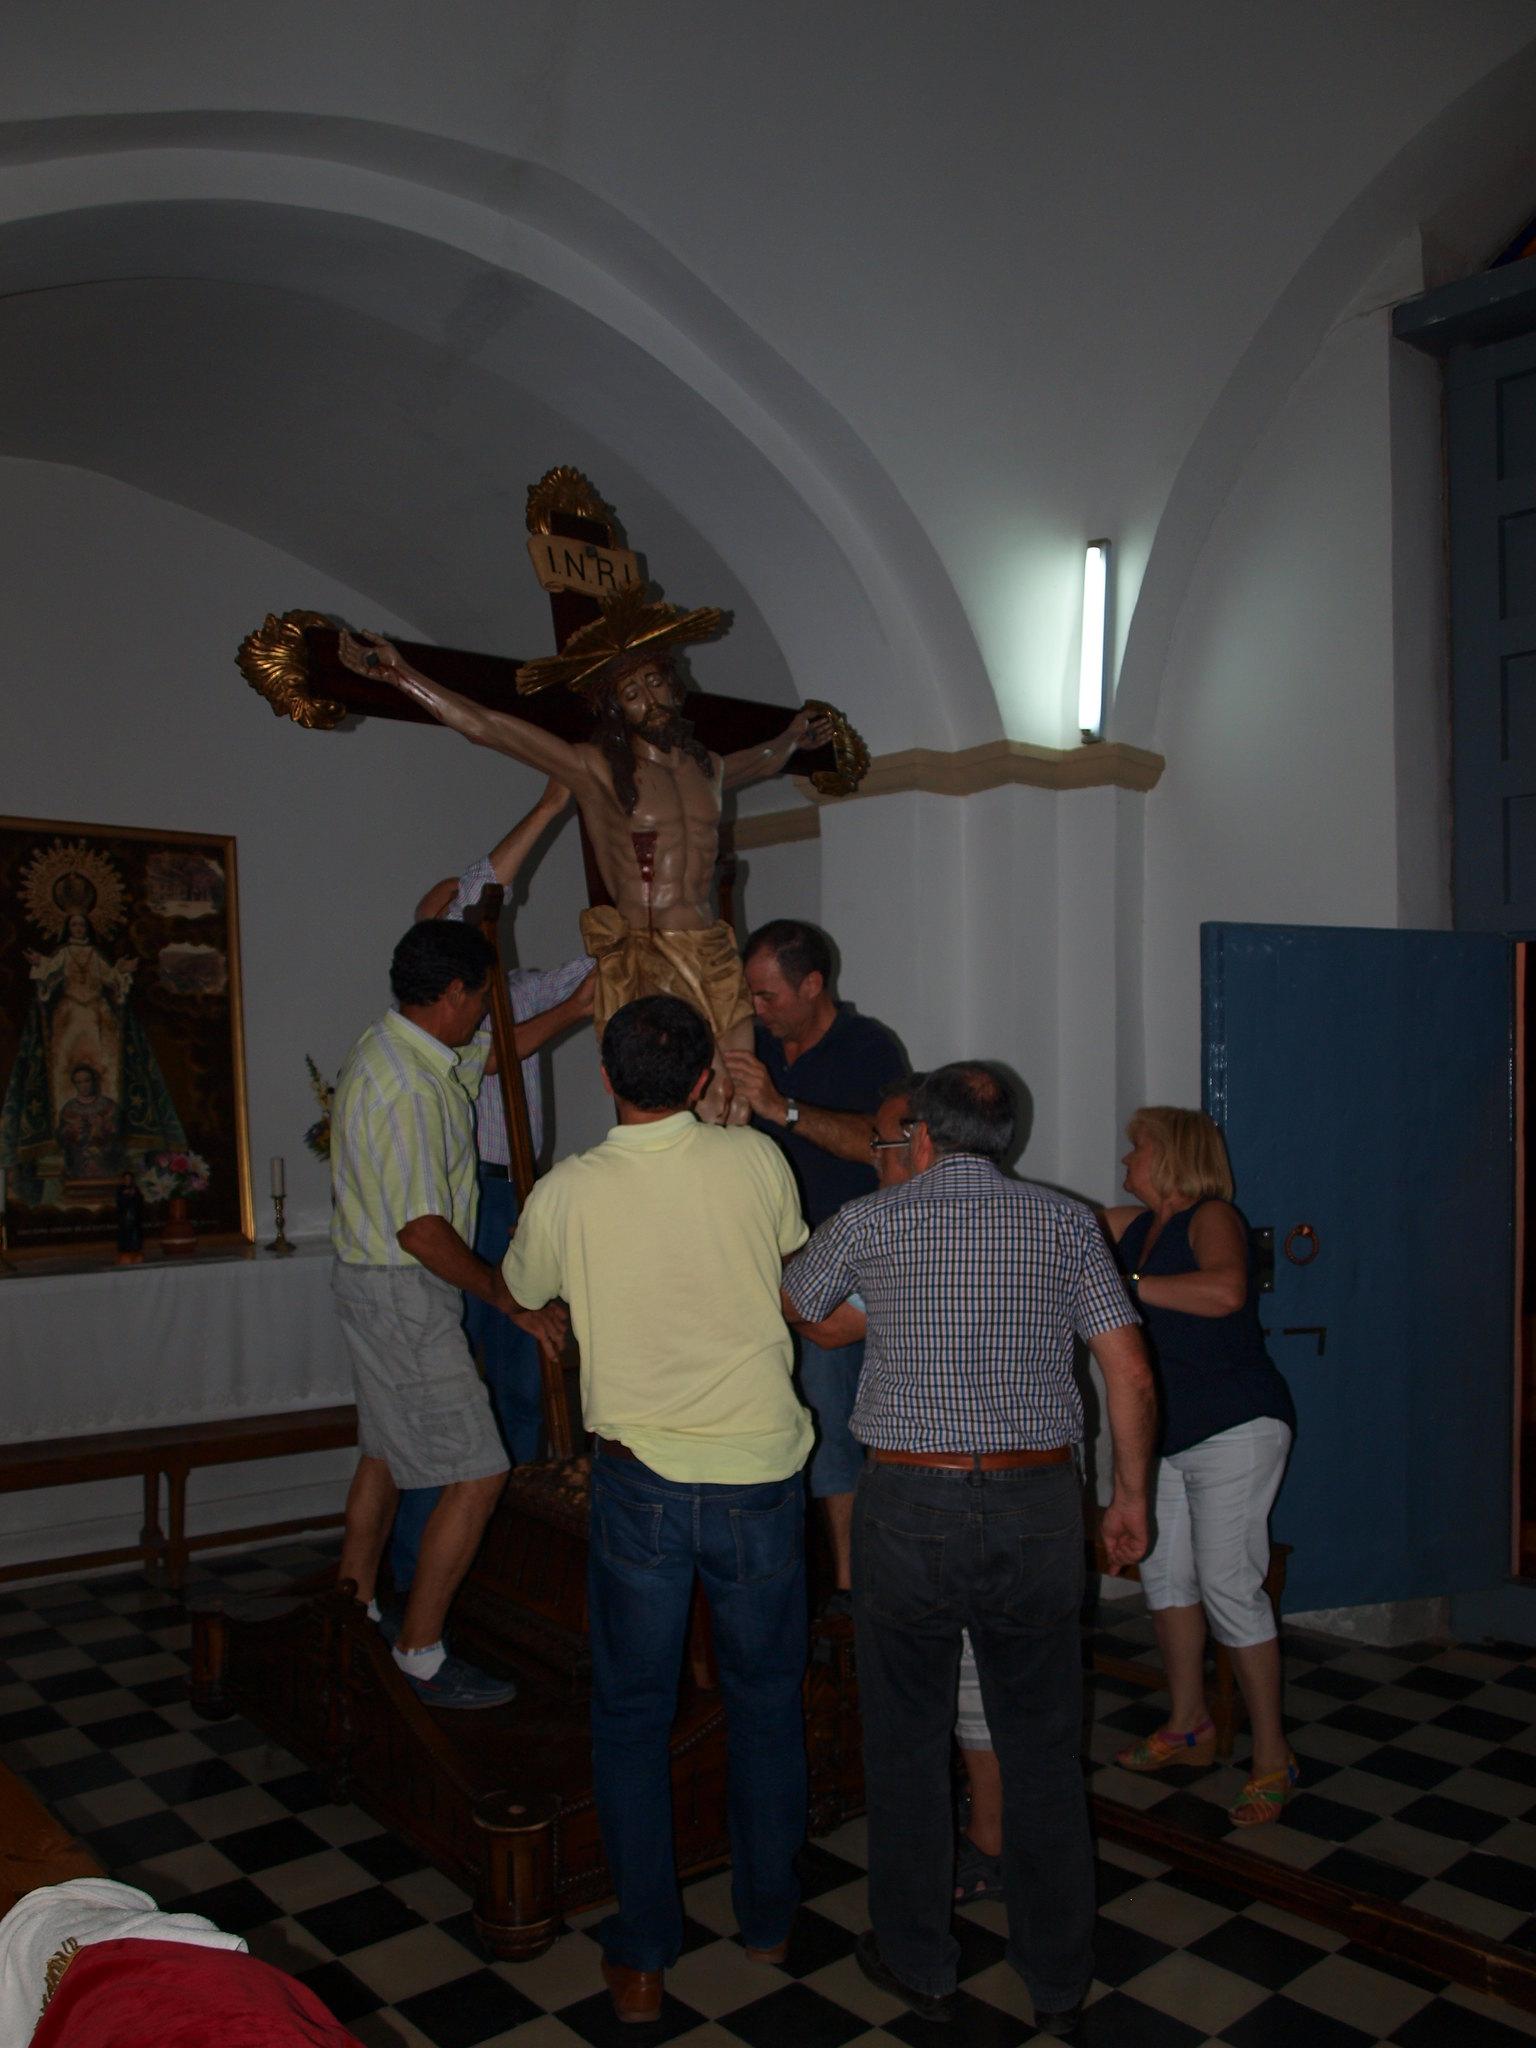 (2014-07-07) - Recogida de Imagen - Paloma Romero Torralba (40)